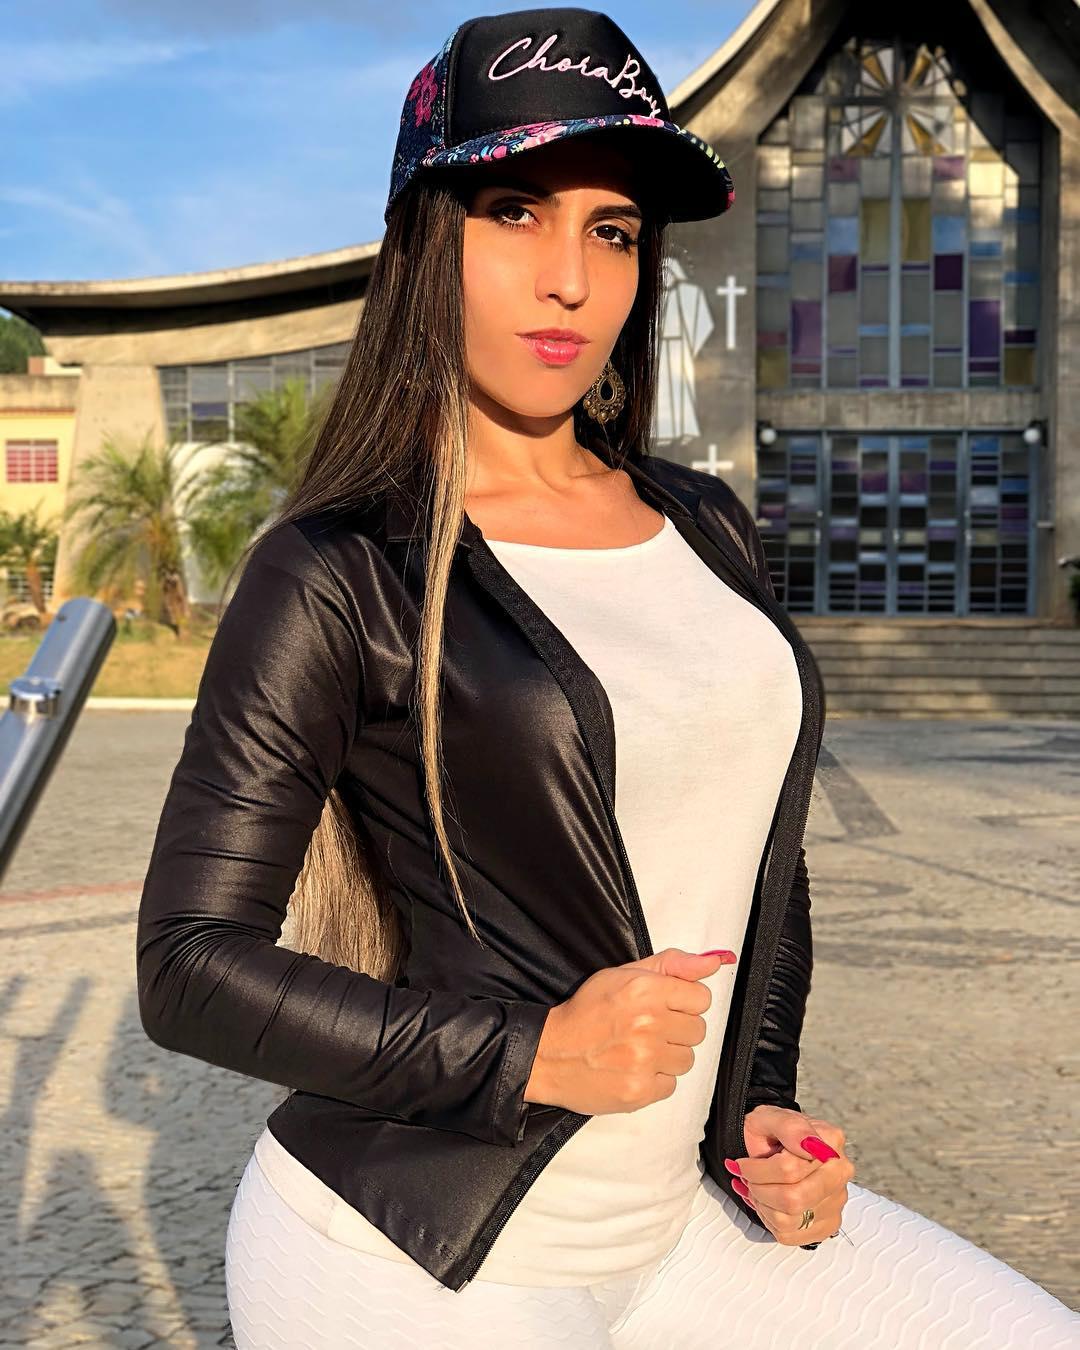 Amanda-Miguez-Wallpapers-Insta-Fit-Bio-1